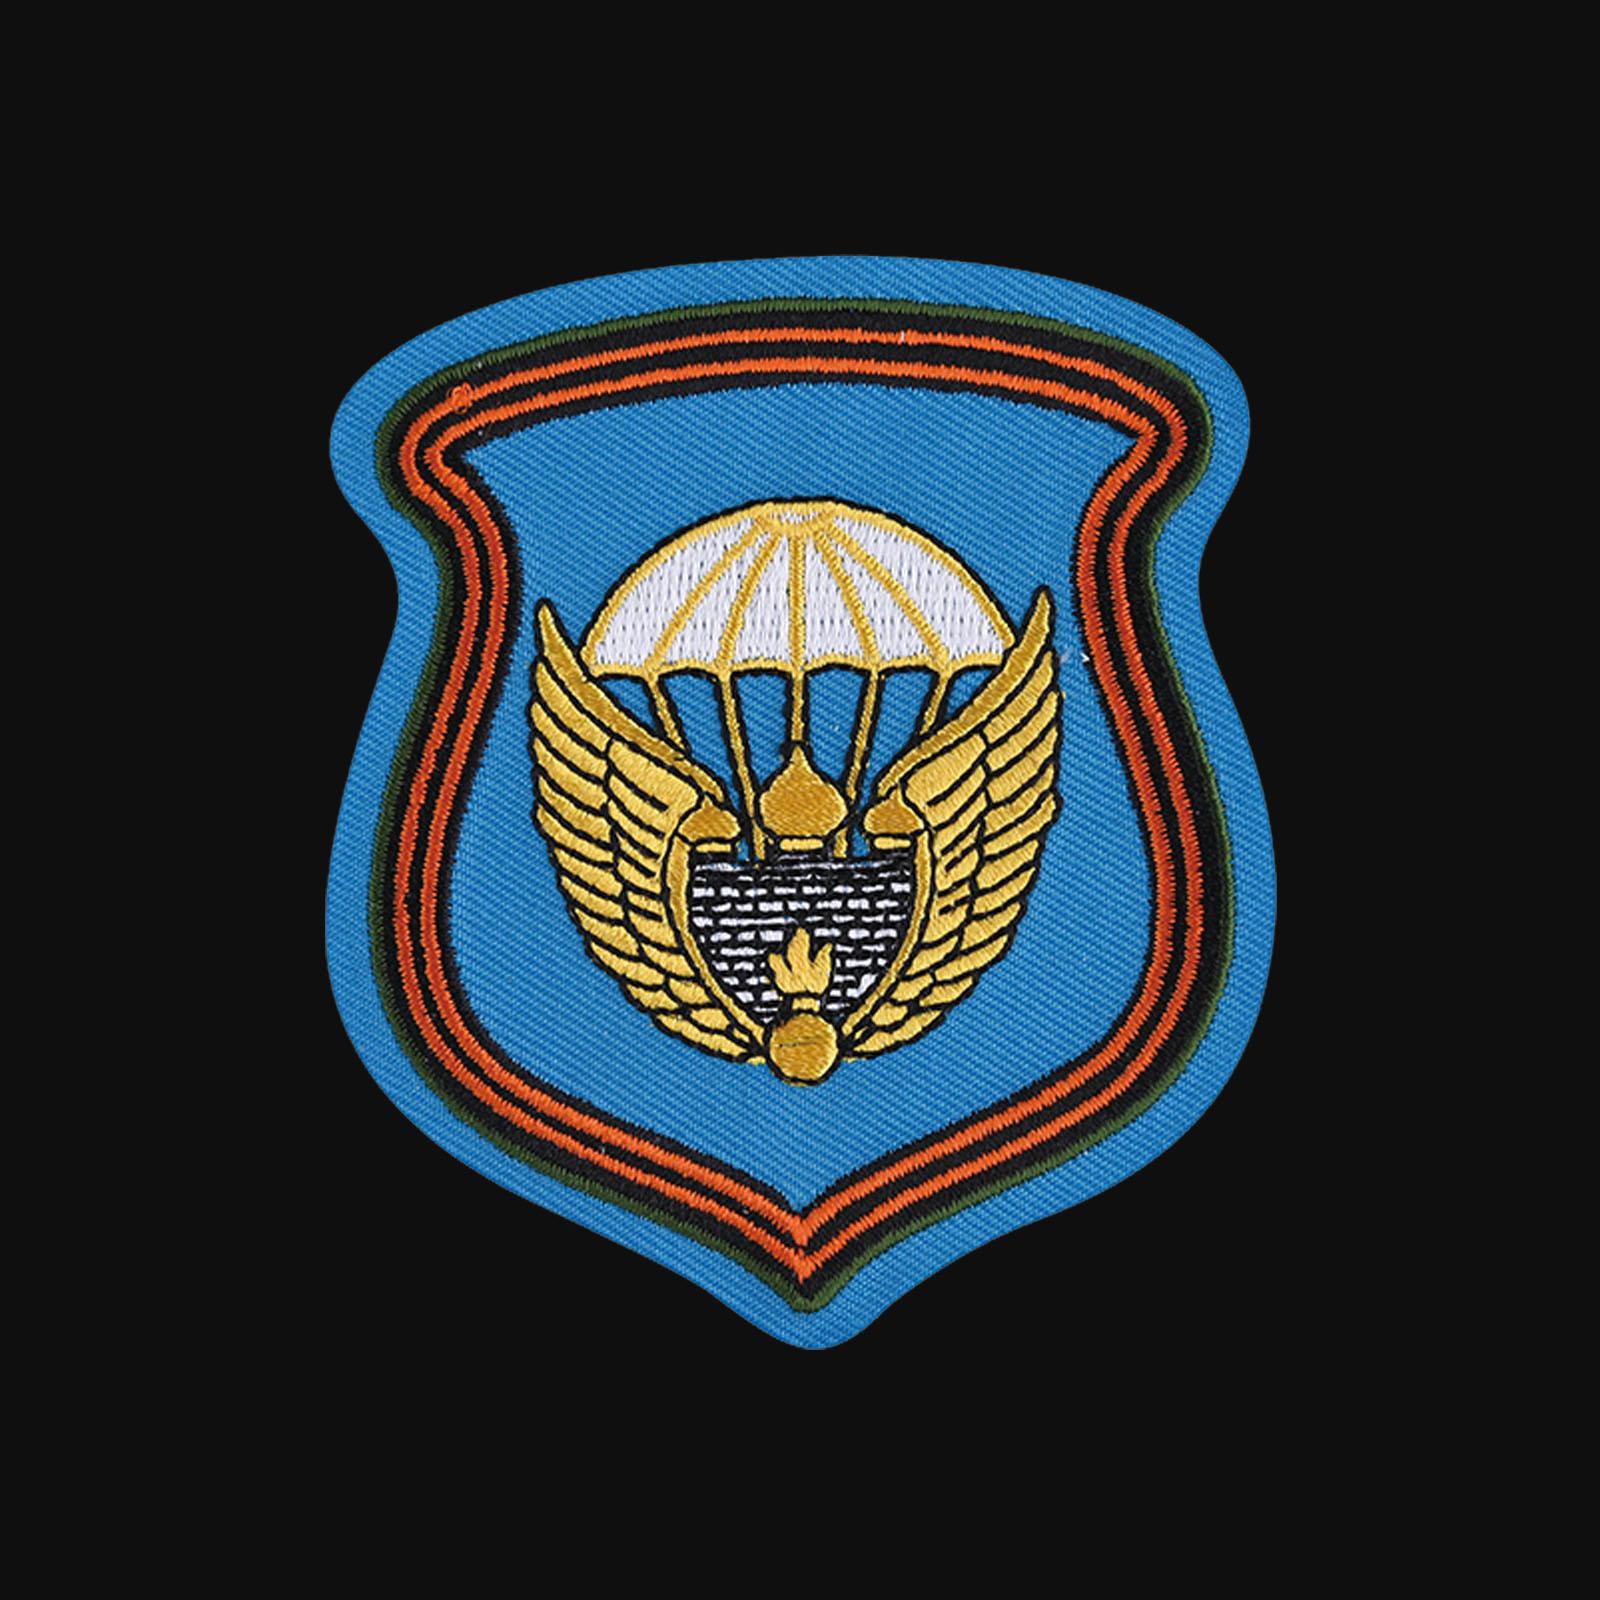 Толстовка-худи 106 гв. Воздушно-десантная дивизия ВДВ